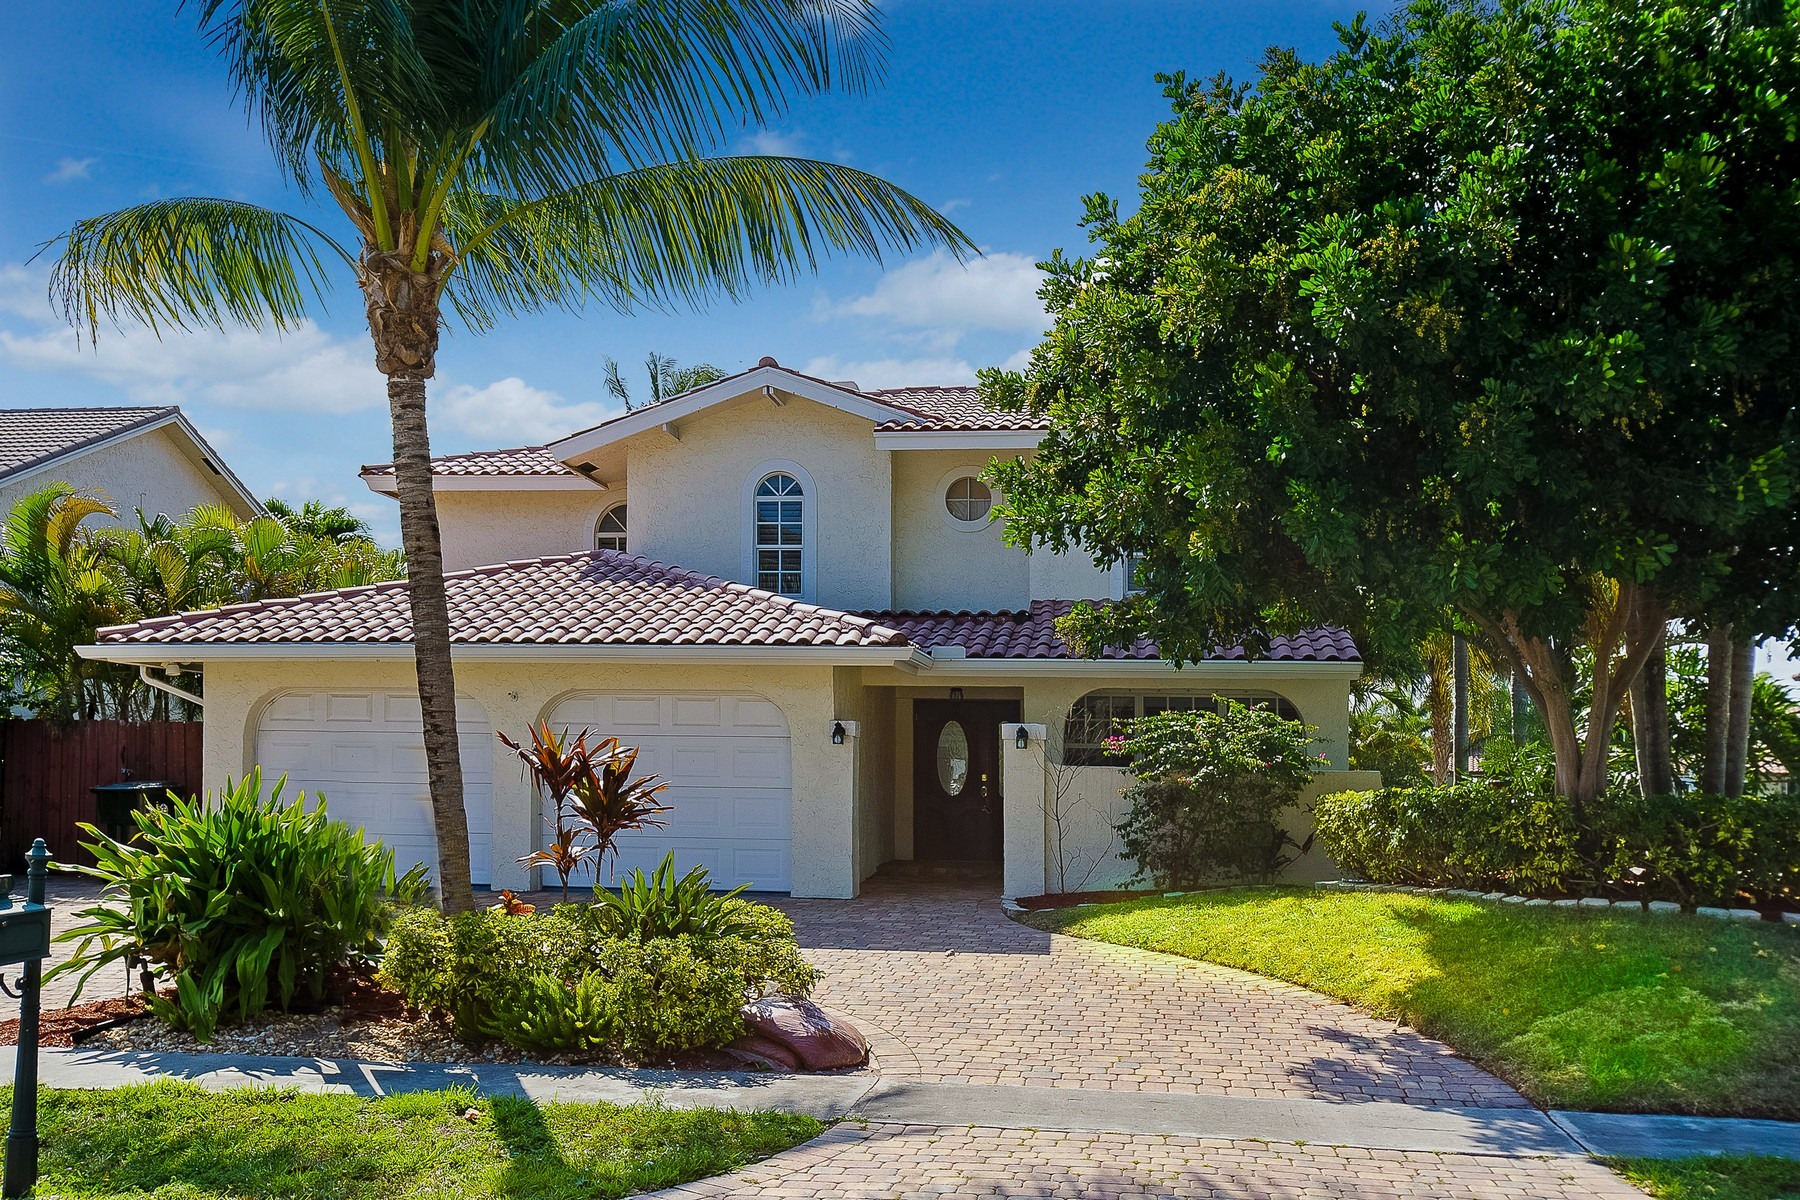 獨棟家庭住宅 為 出售 在 1573 SW 5th Ave , Boca Raton, FL 33432 Boca Raton, 佛羅里達州 33432 美國